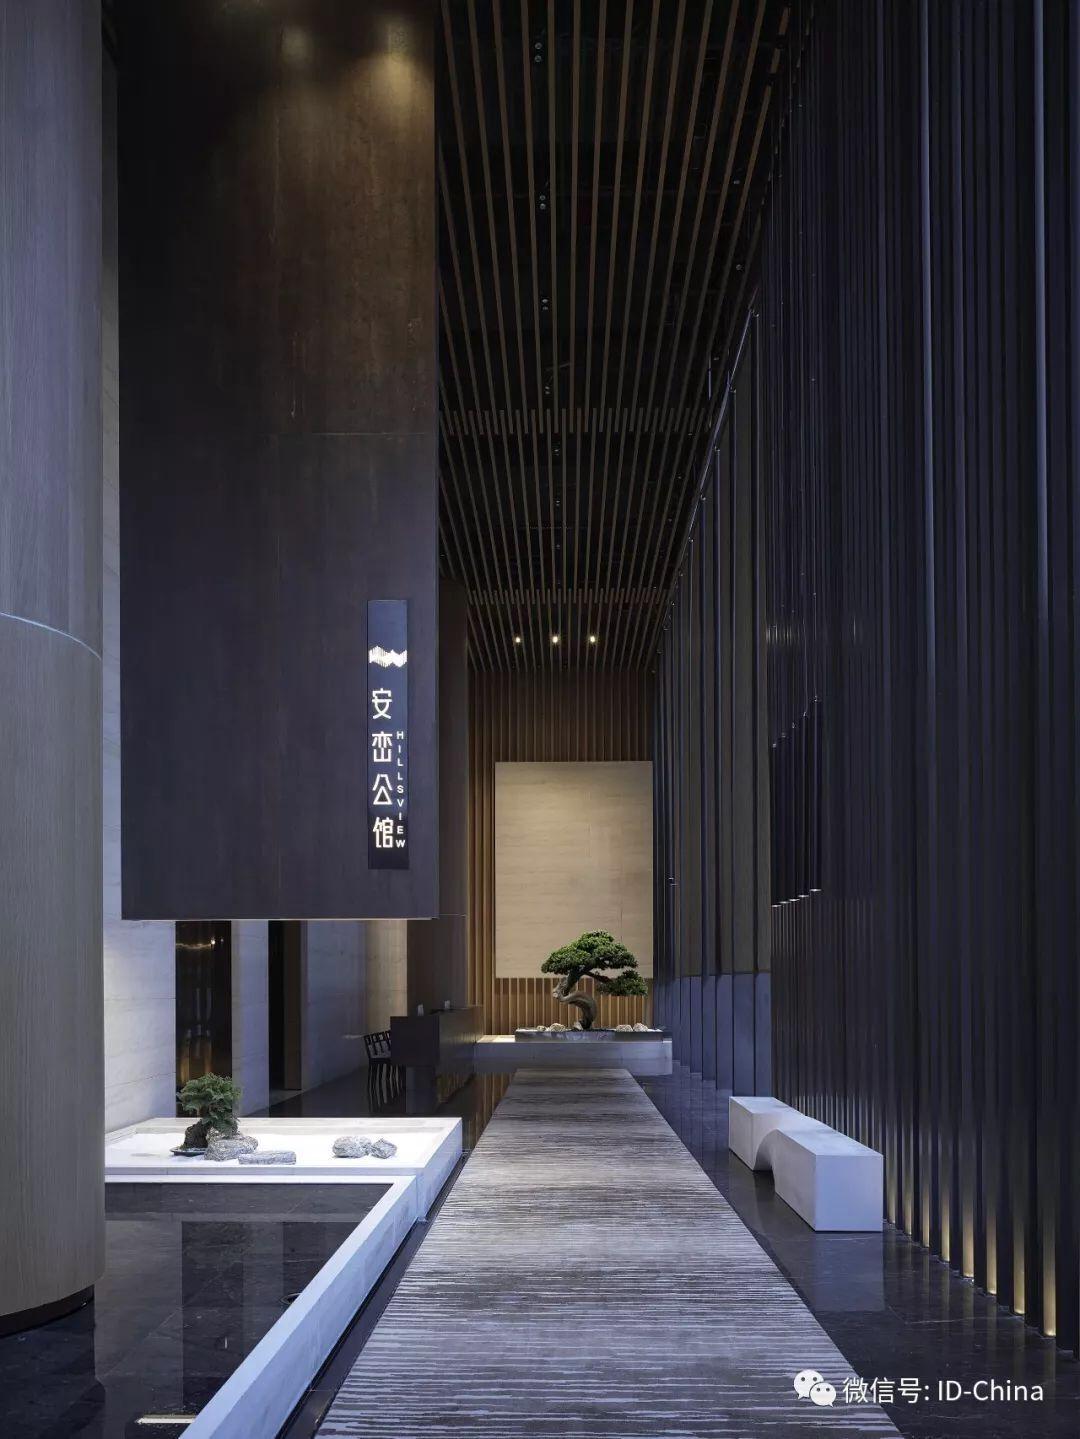 Pin by silviany on archfacade pinterest interior interior